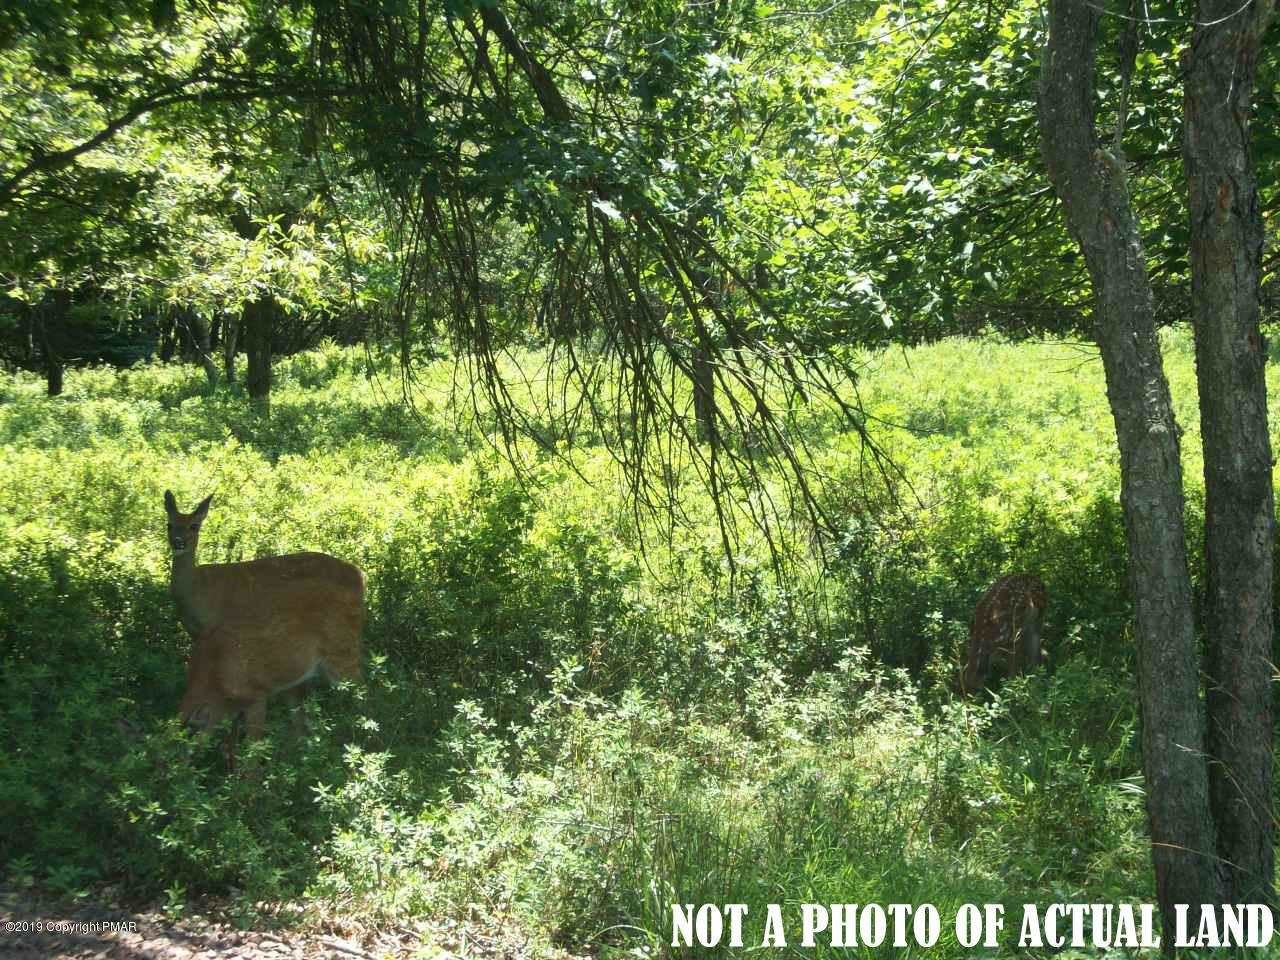 1134A Lackawanna & Crazy Horse Trail, Albrightsville, PA, 18210 United States